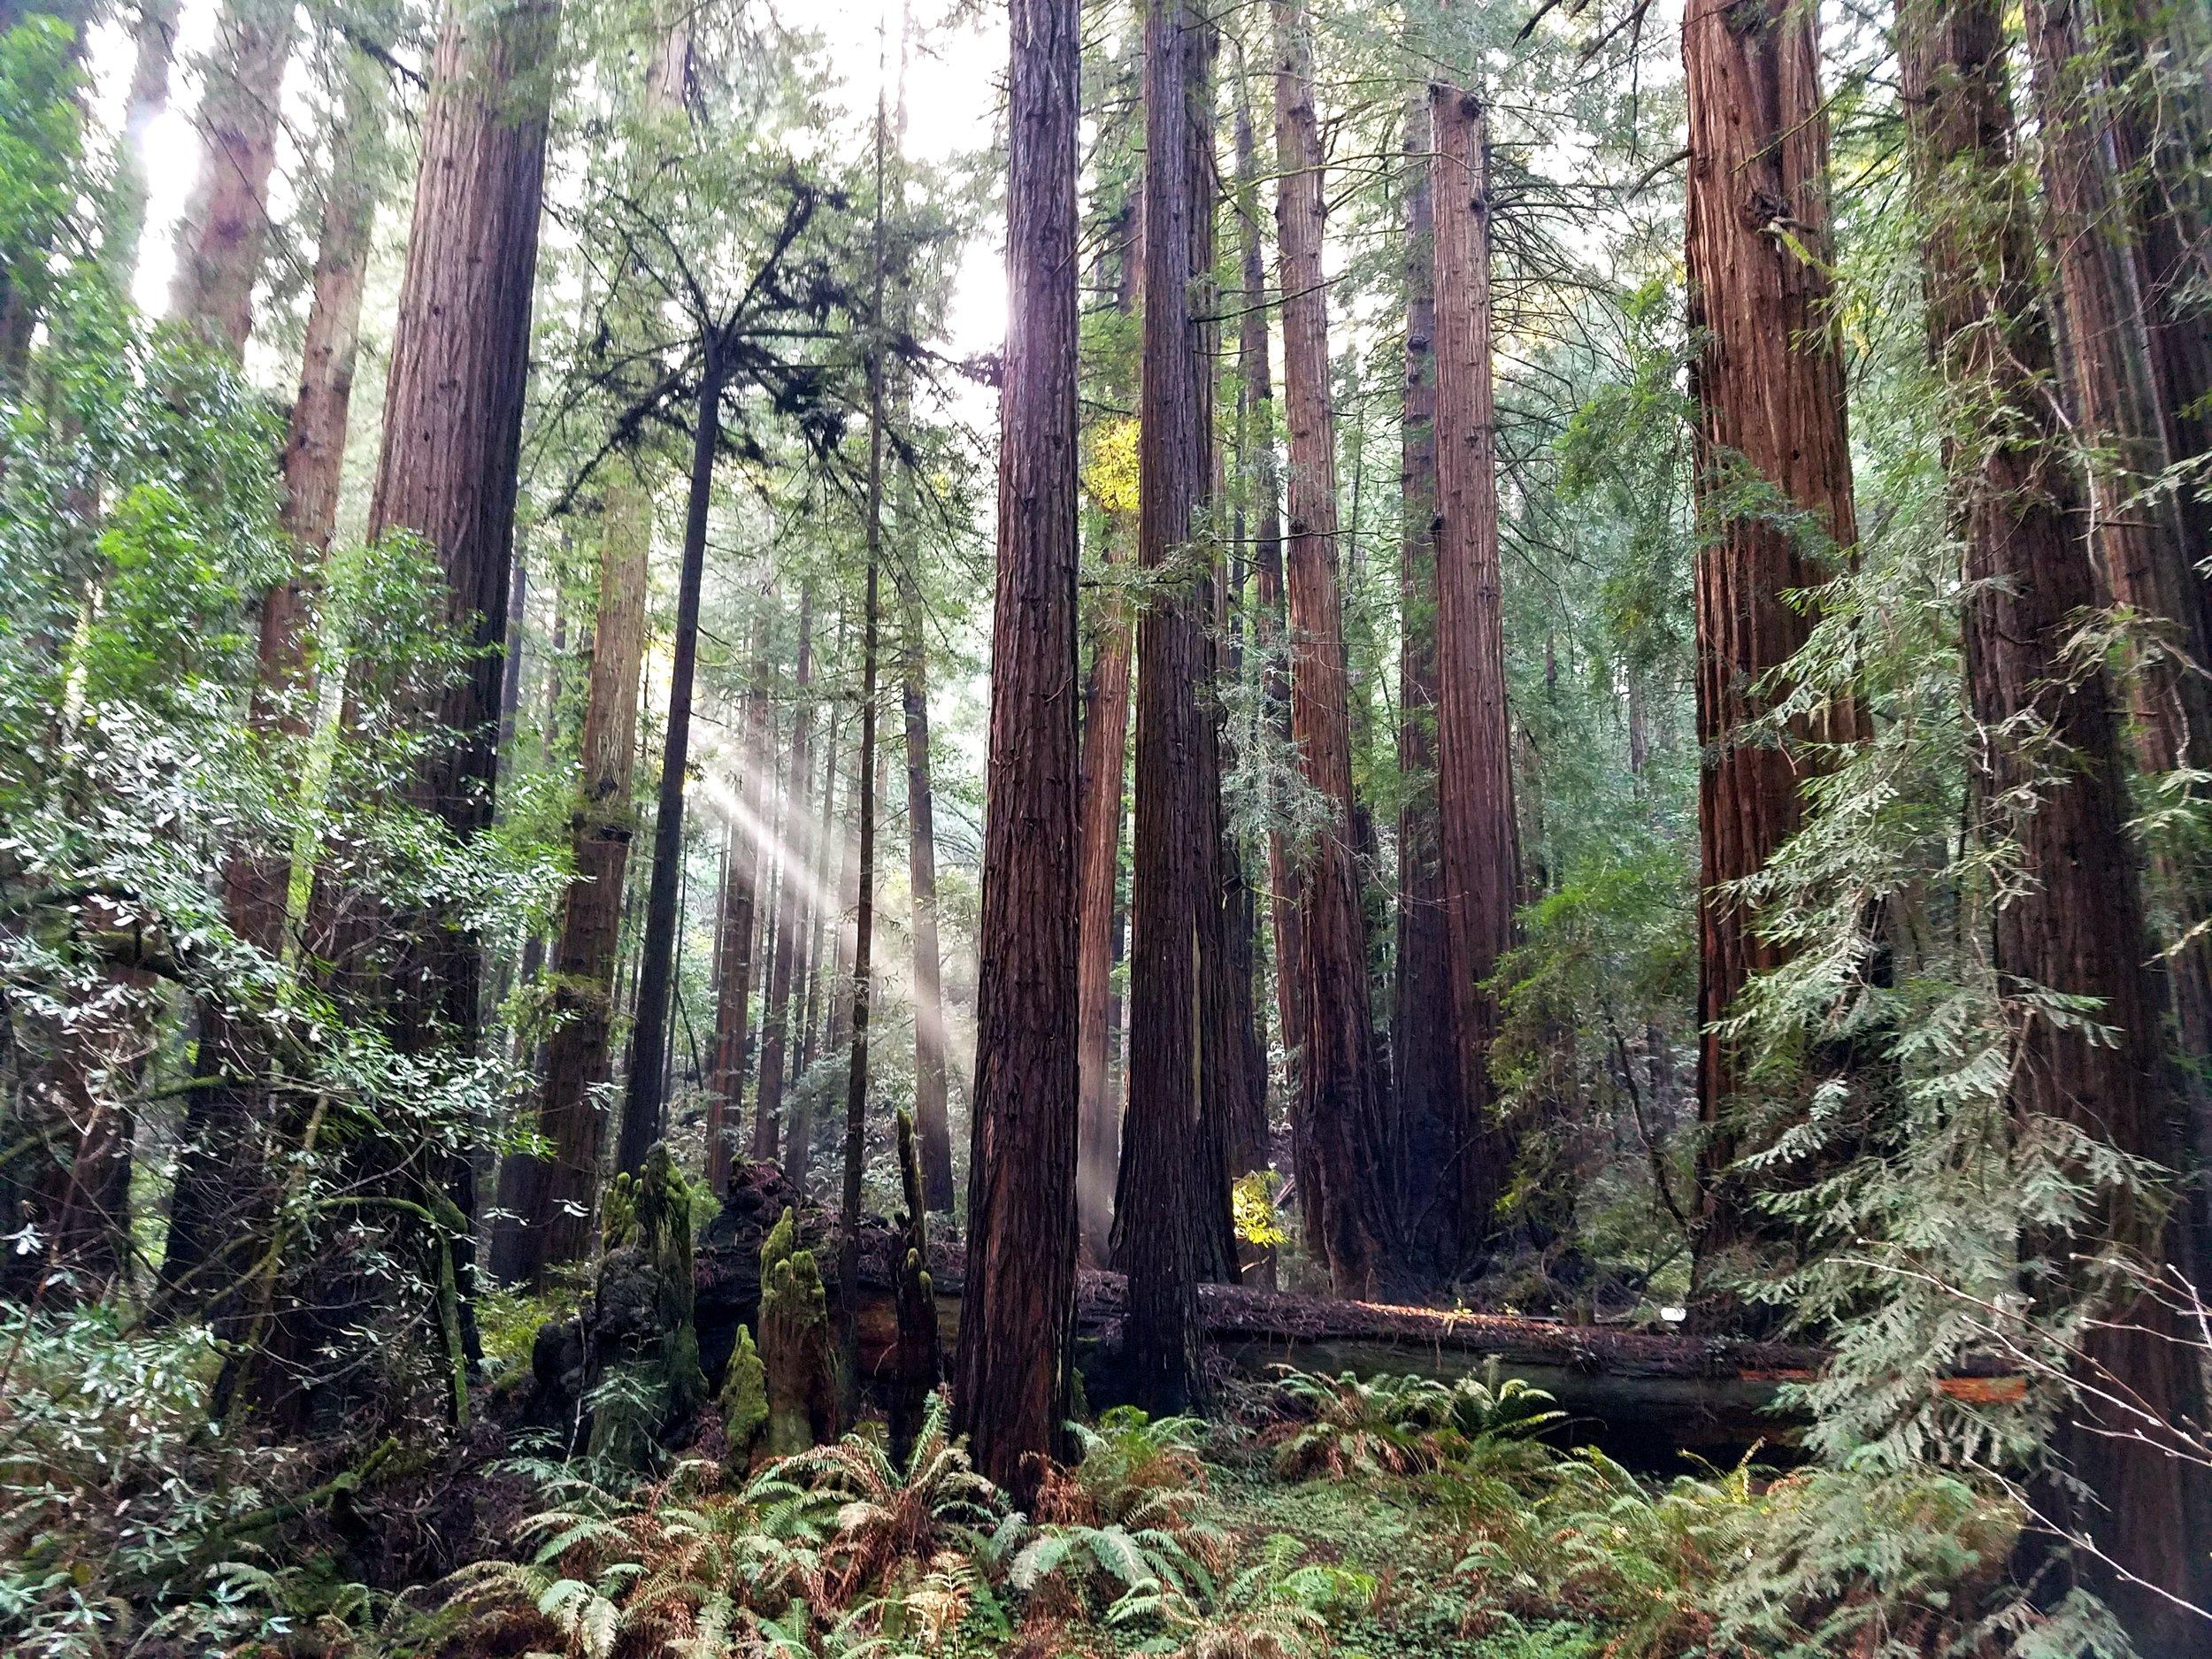 Magical Muir Woods